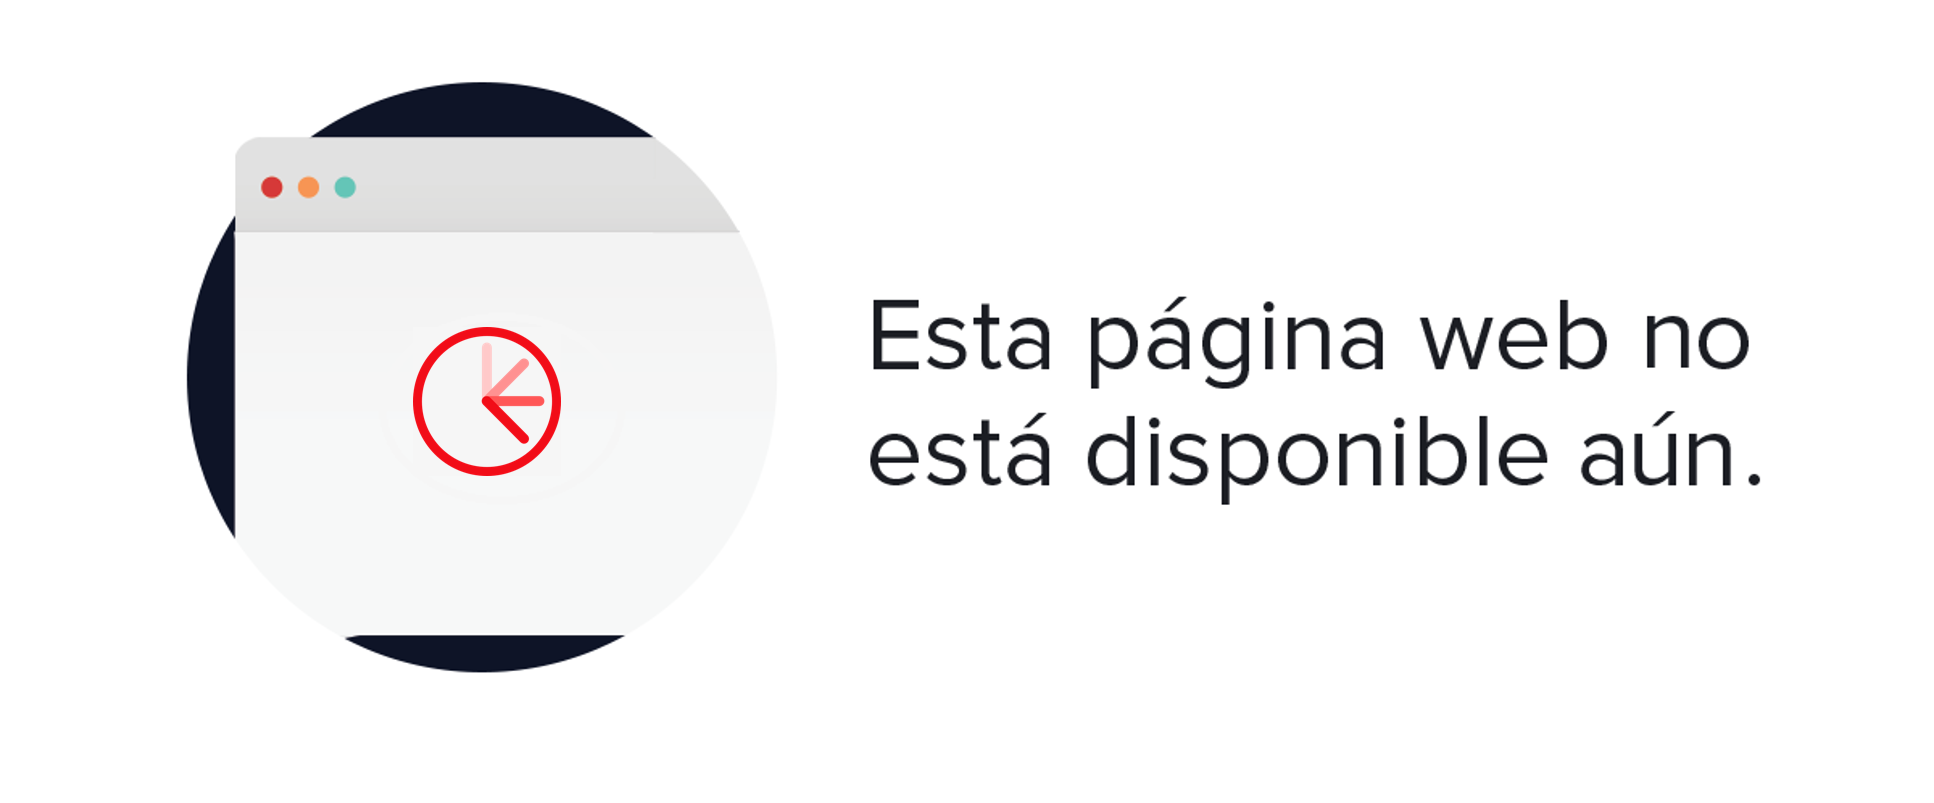 Tintoretto - Blazer básica de mujer Tintoretto gris Gris 001029431400414036 - MWKZRSR